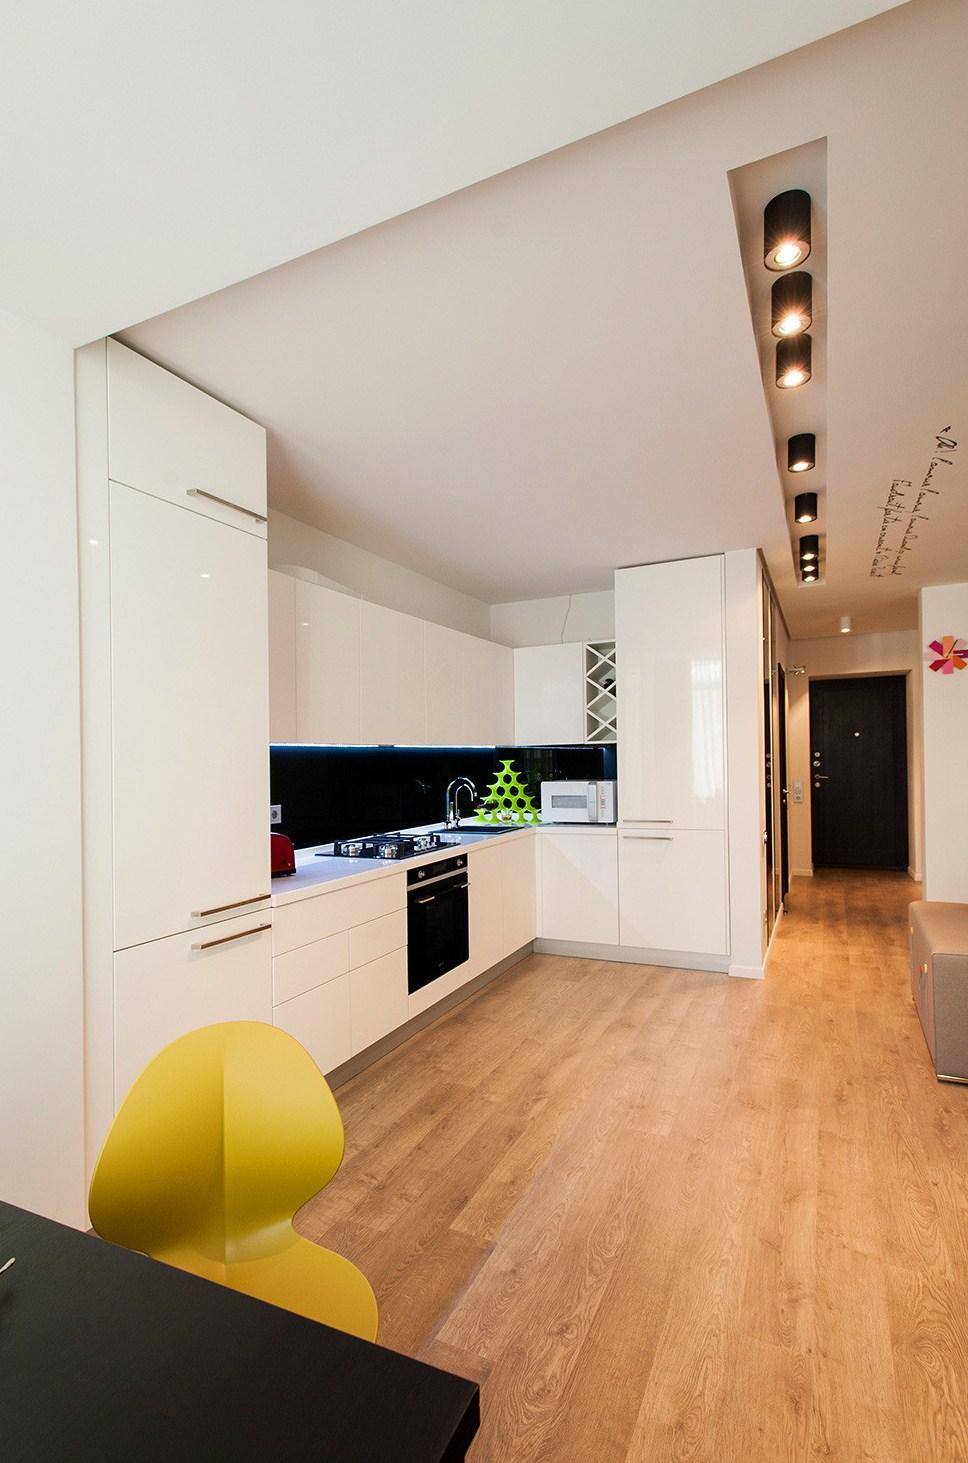 Дизайн студия уютная квартира фото